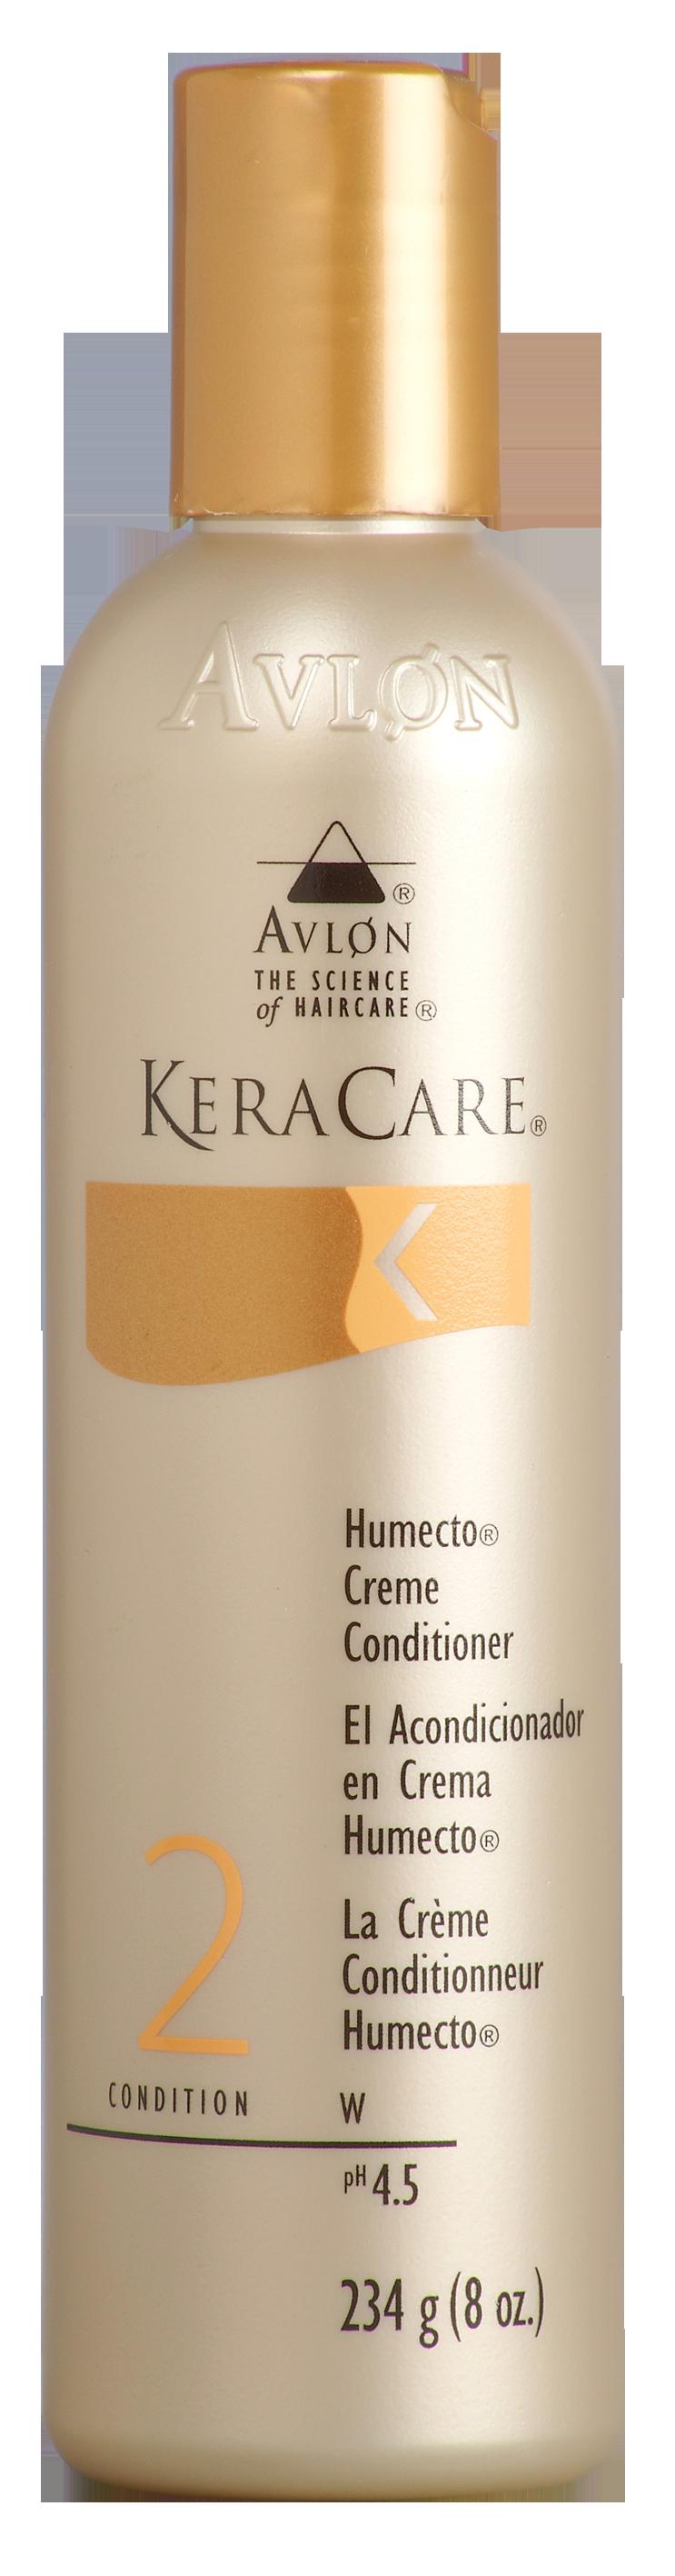 Cleansing Creme.png